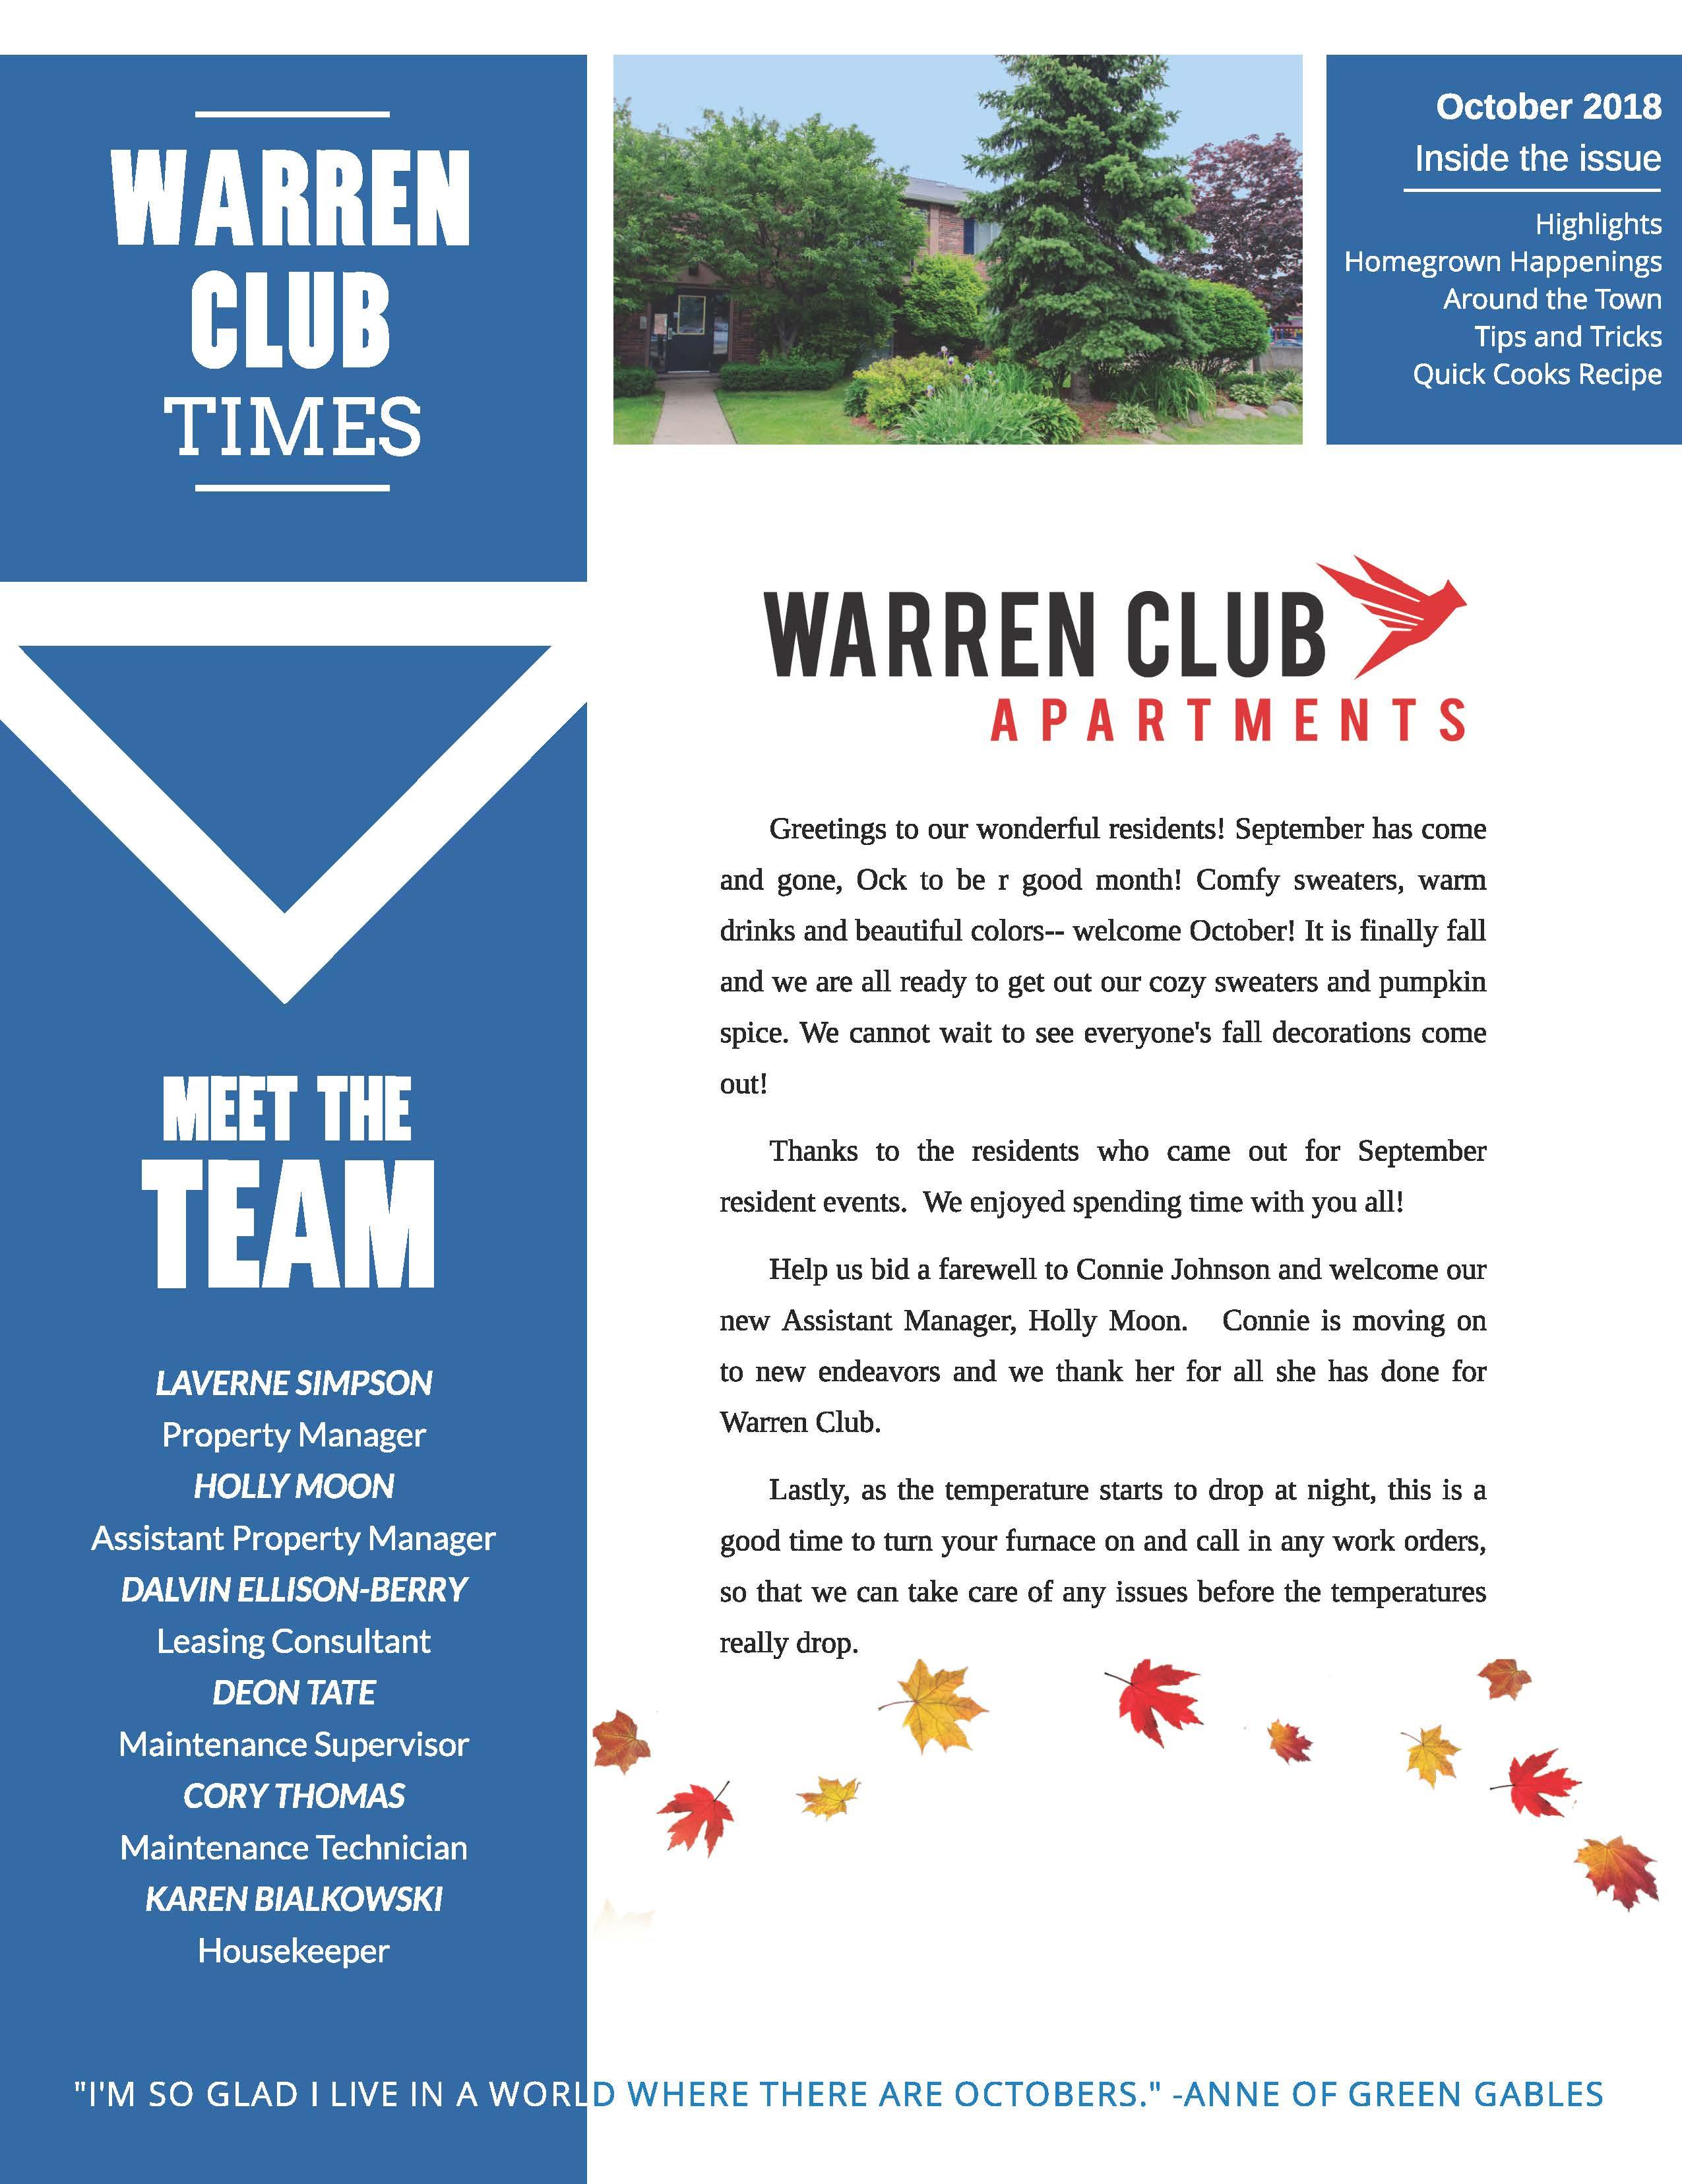 The Warren Club Community